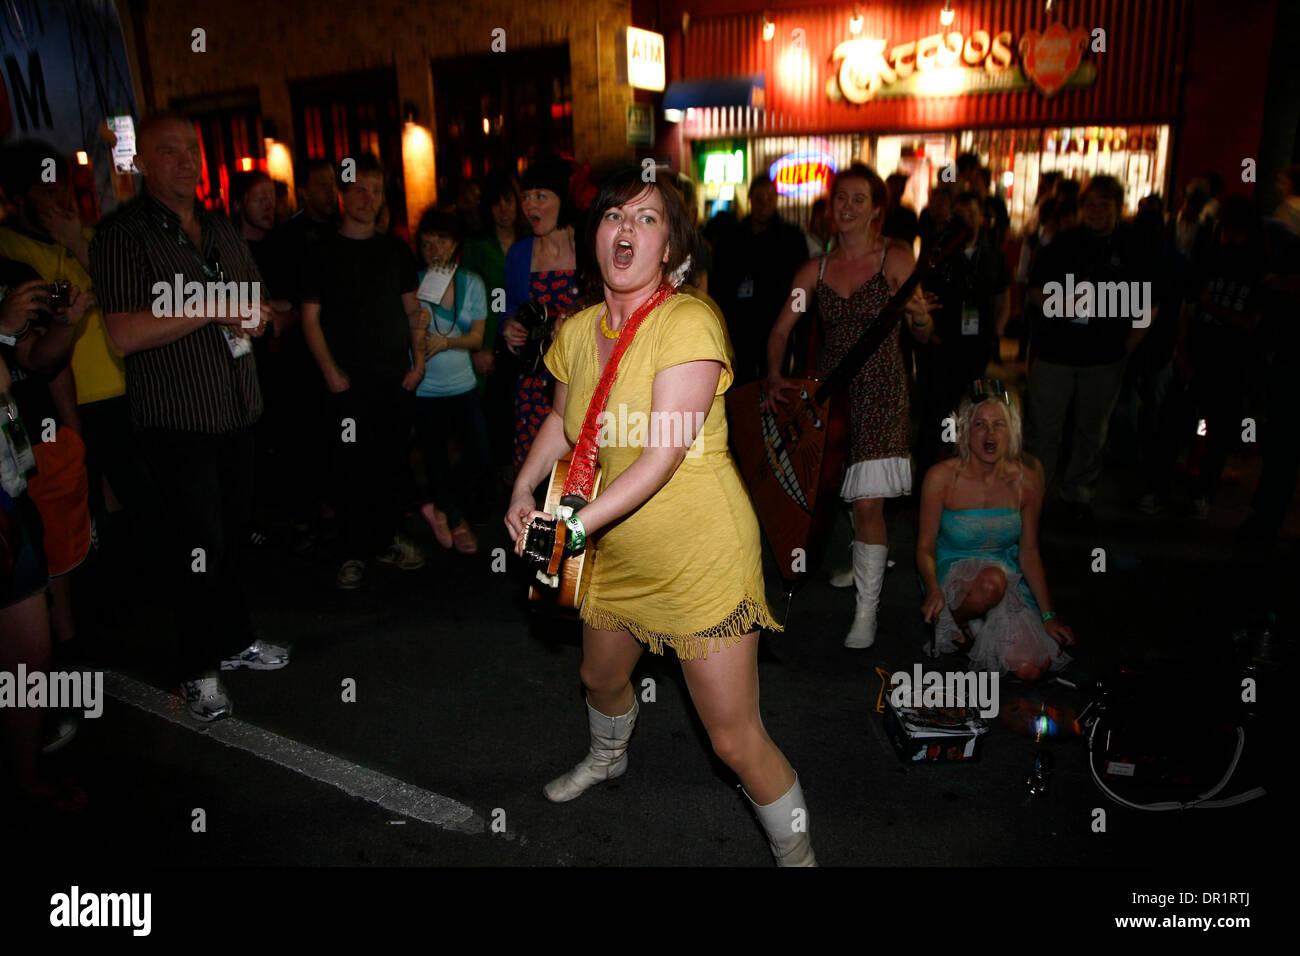 Mar 18, 2009 - Austin, Texas, USA - 'Katzenjammer' performing at Habana Calle during SXSW 2009 - Day One of South By Southwest Music Festival. (Credit Image: © Rahav Segev/ZUMA Press) - Stock Image